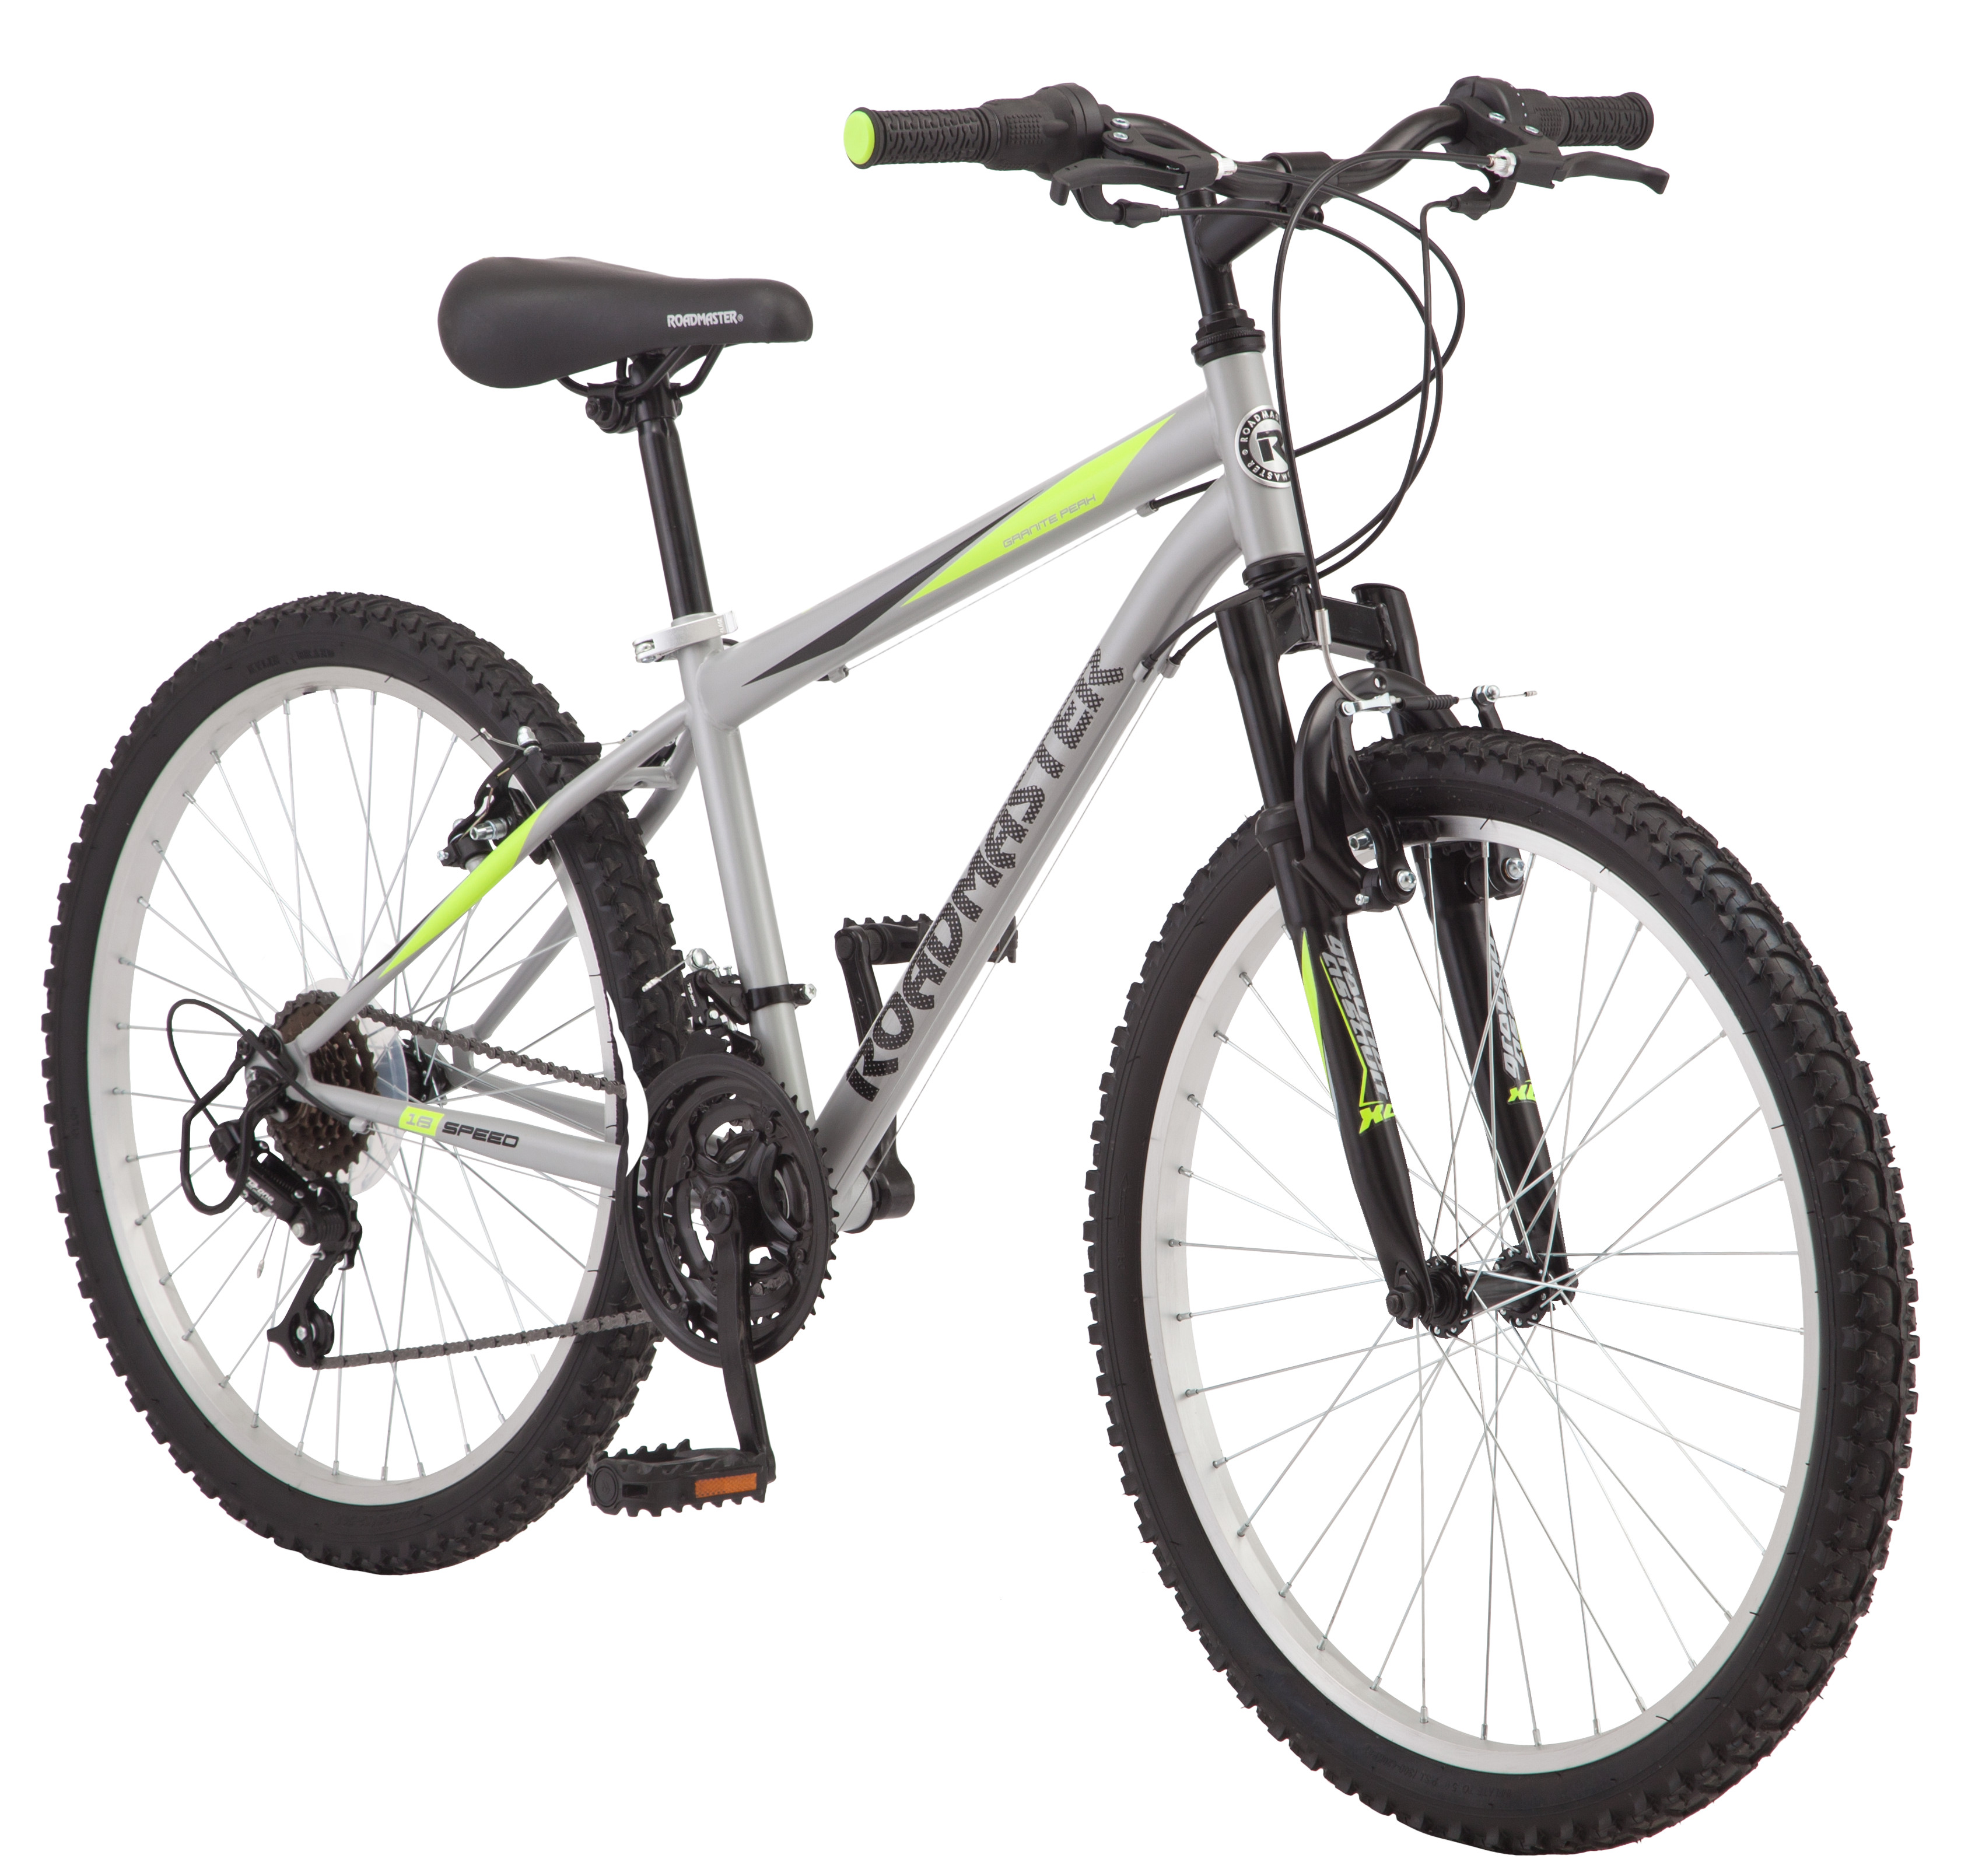 "Roadmaster 24"" Granite Peak Boy's Mountain Bike, Silver"